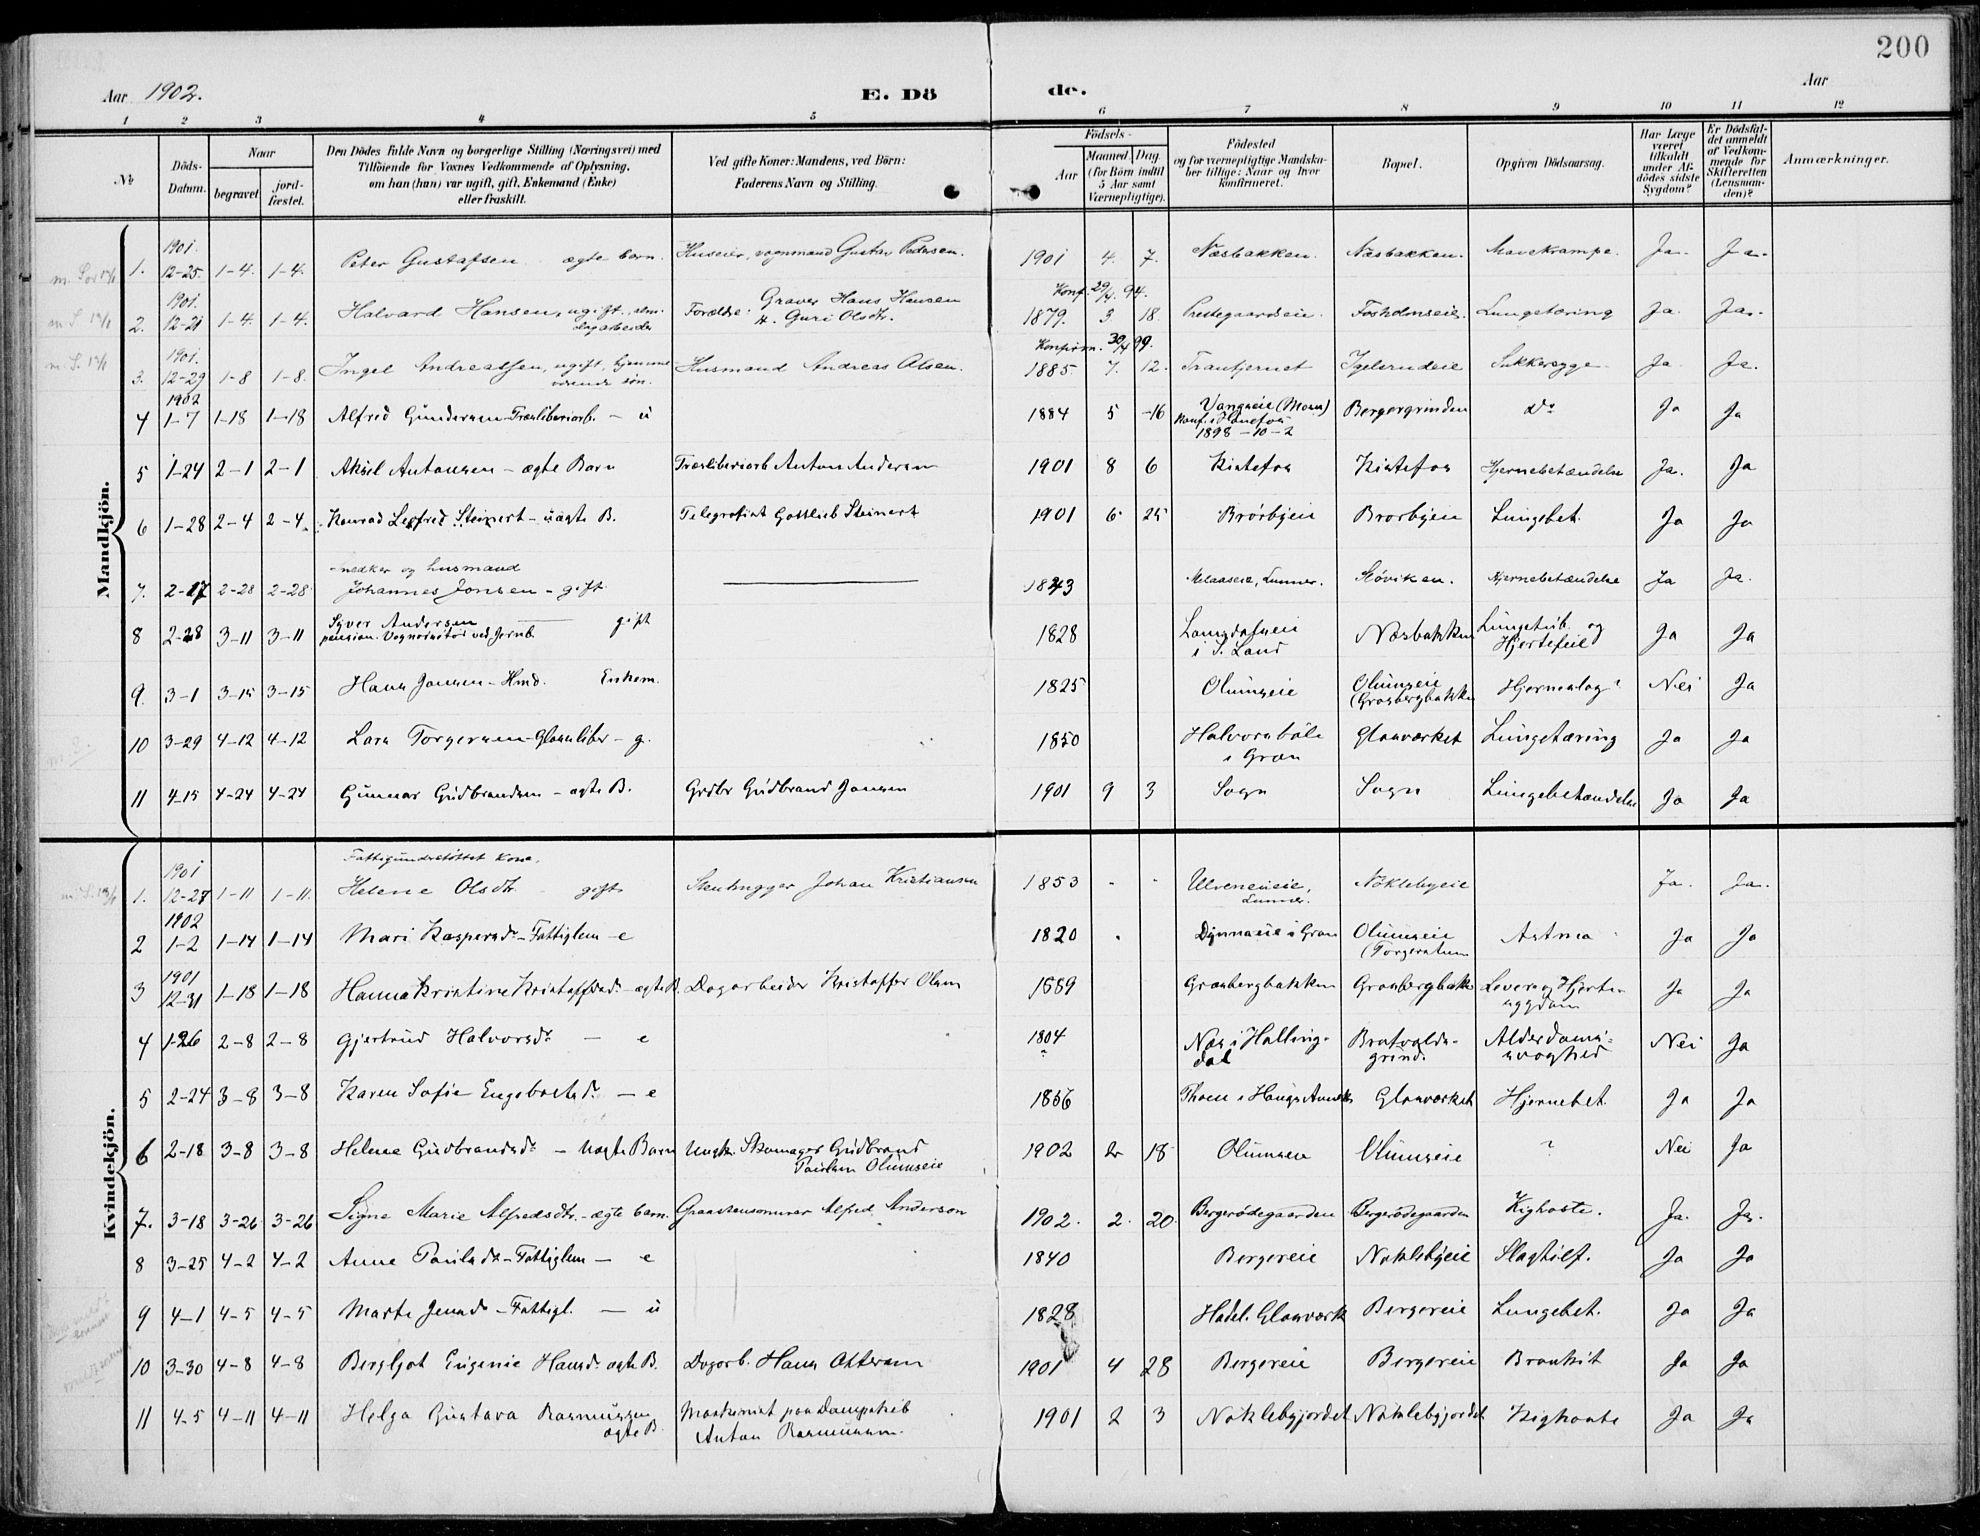 SAH, Jevnaker prestekontor, Ministerialbok nr. 11, 1902-1913, s. 200